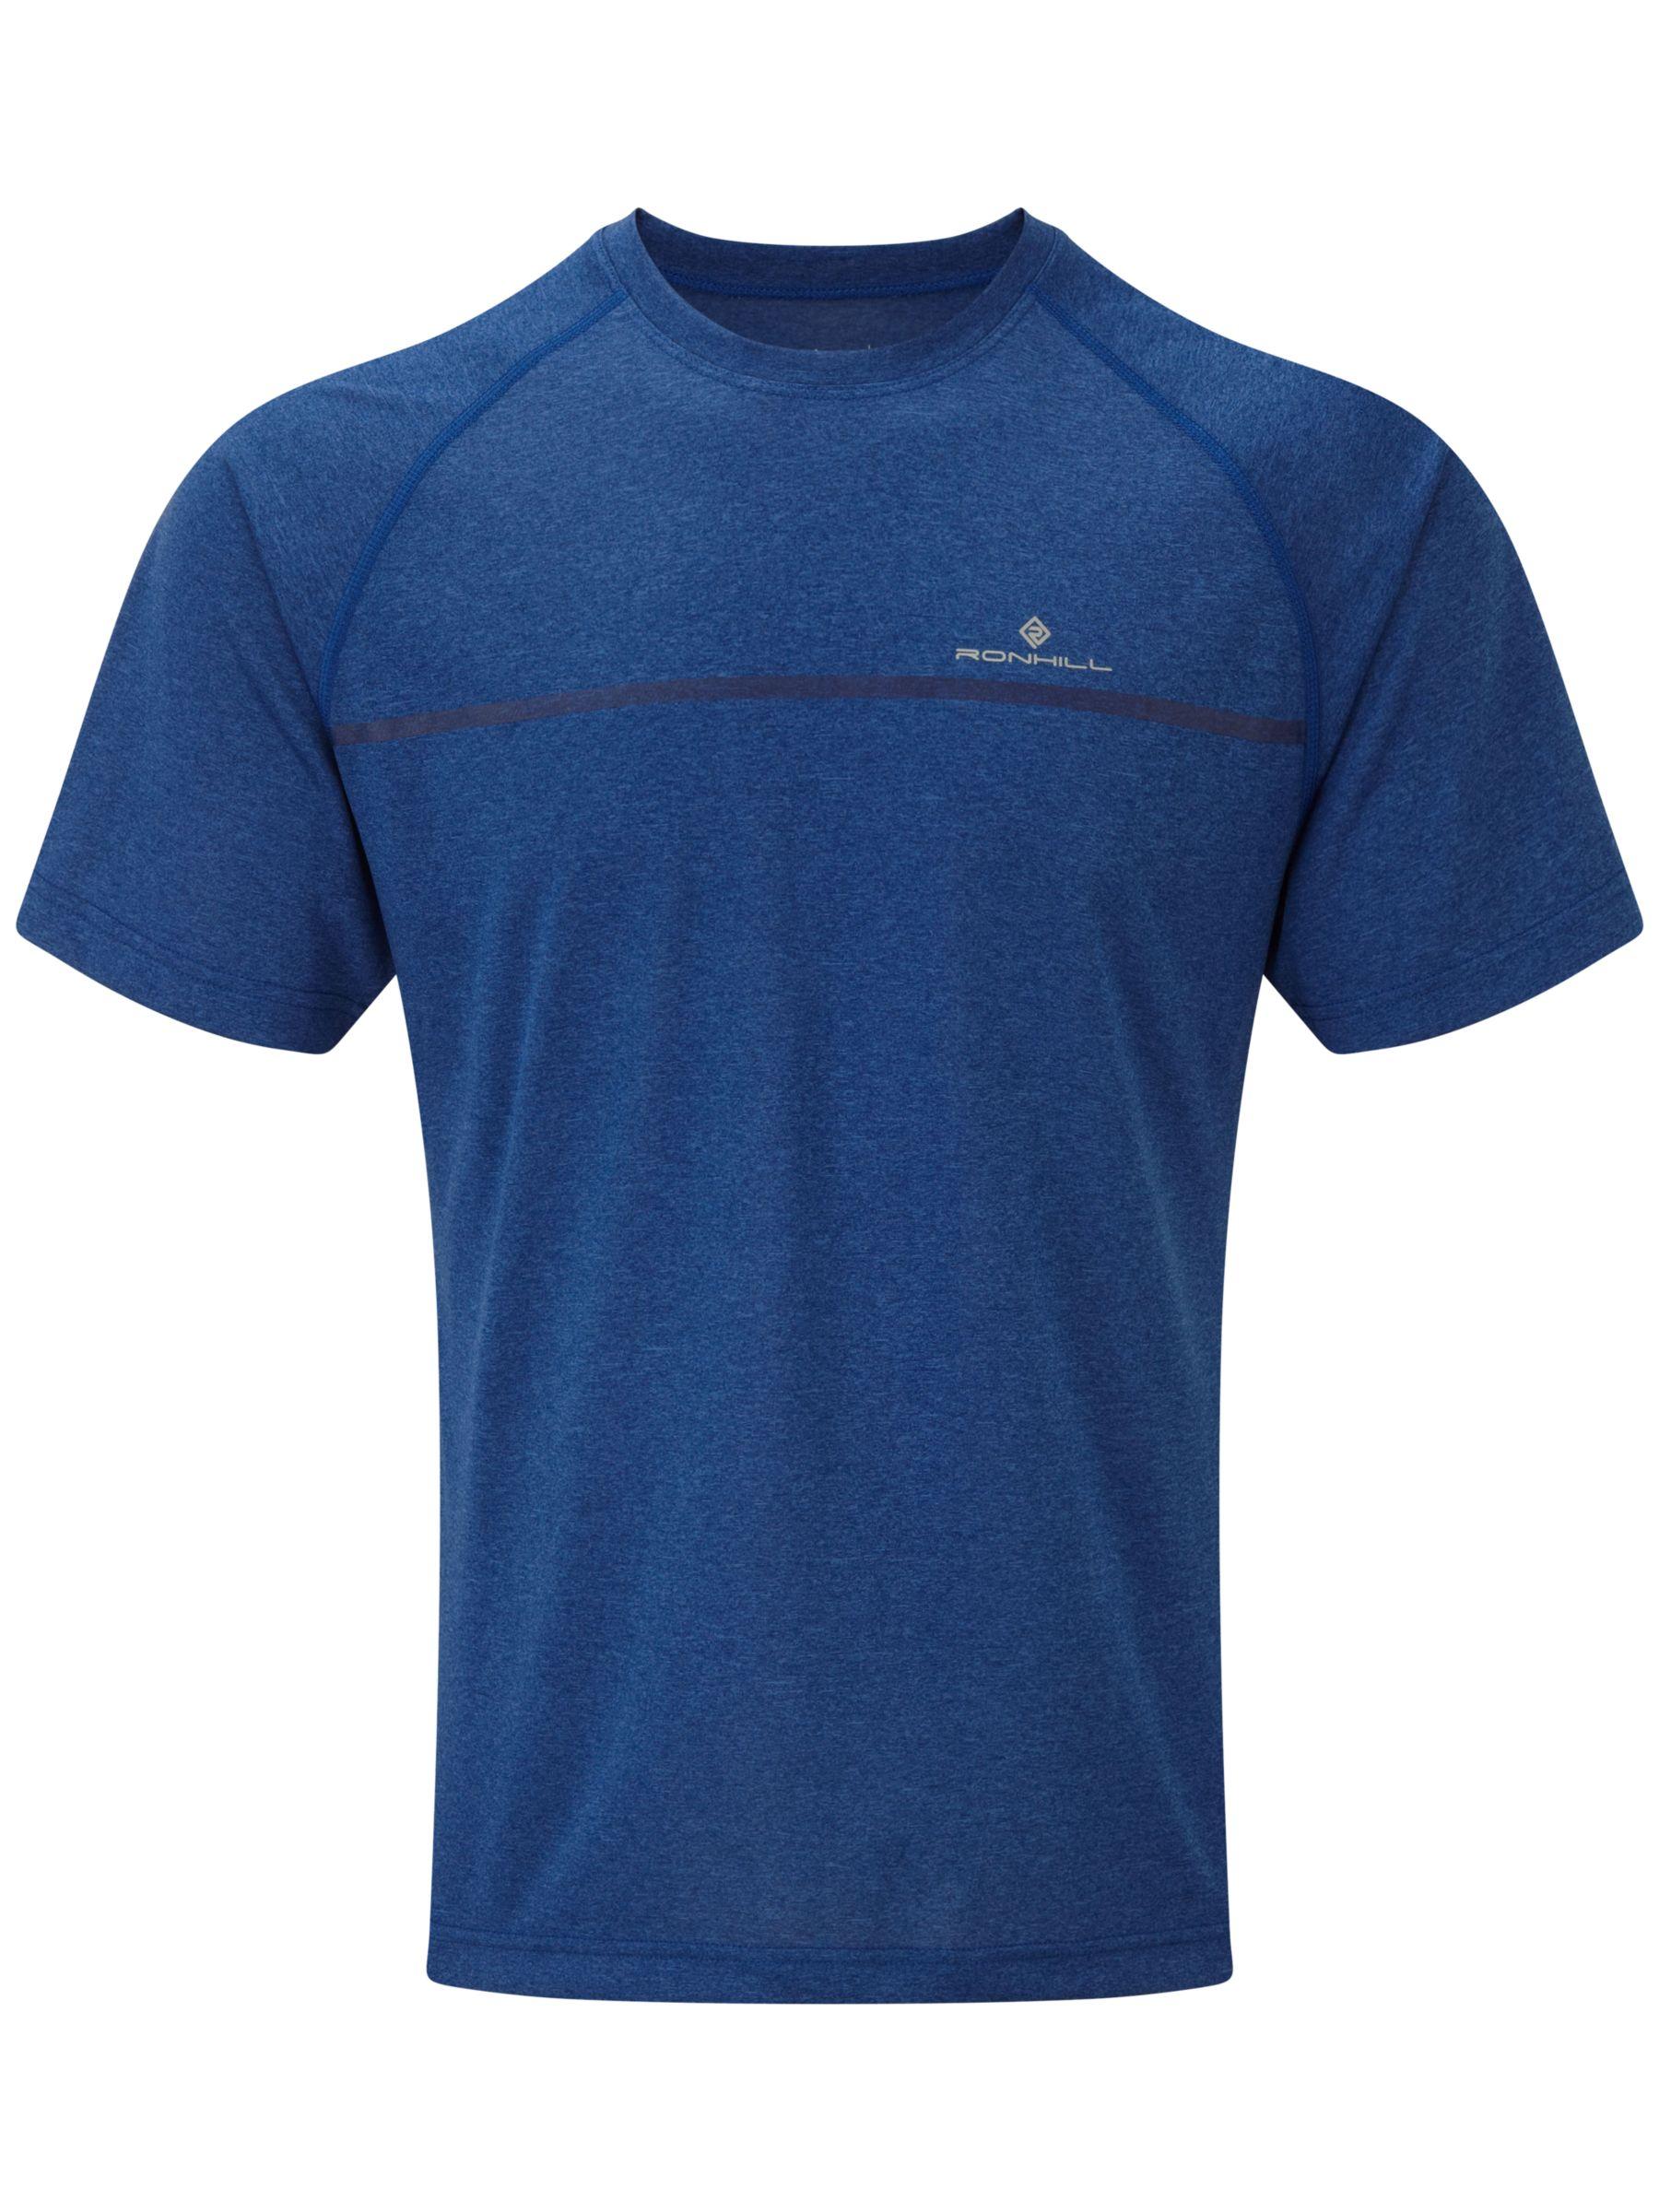 Ronhill Ronhill Everyday Short Sleeve T-Shirt